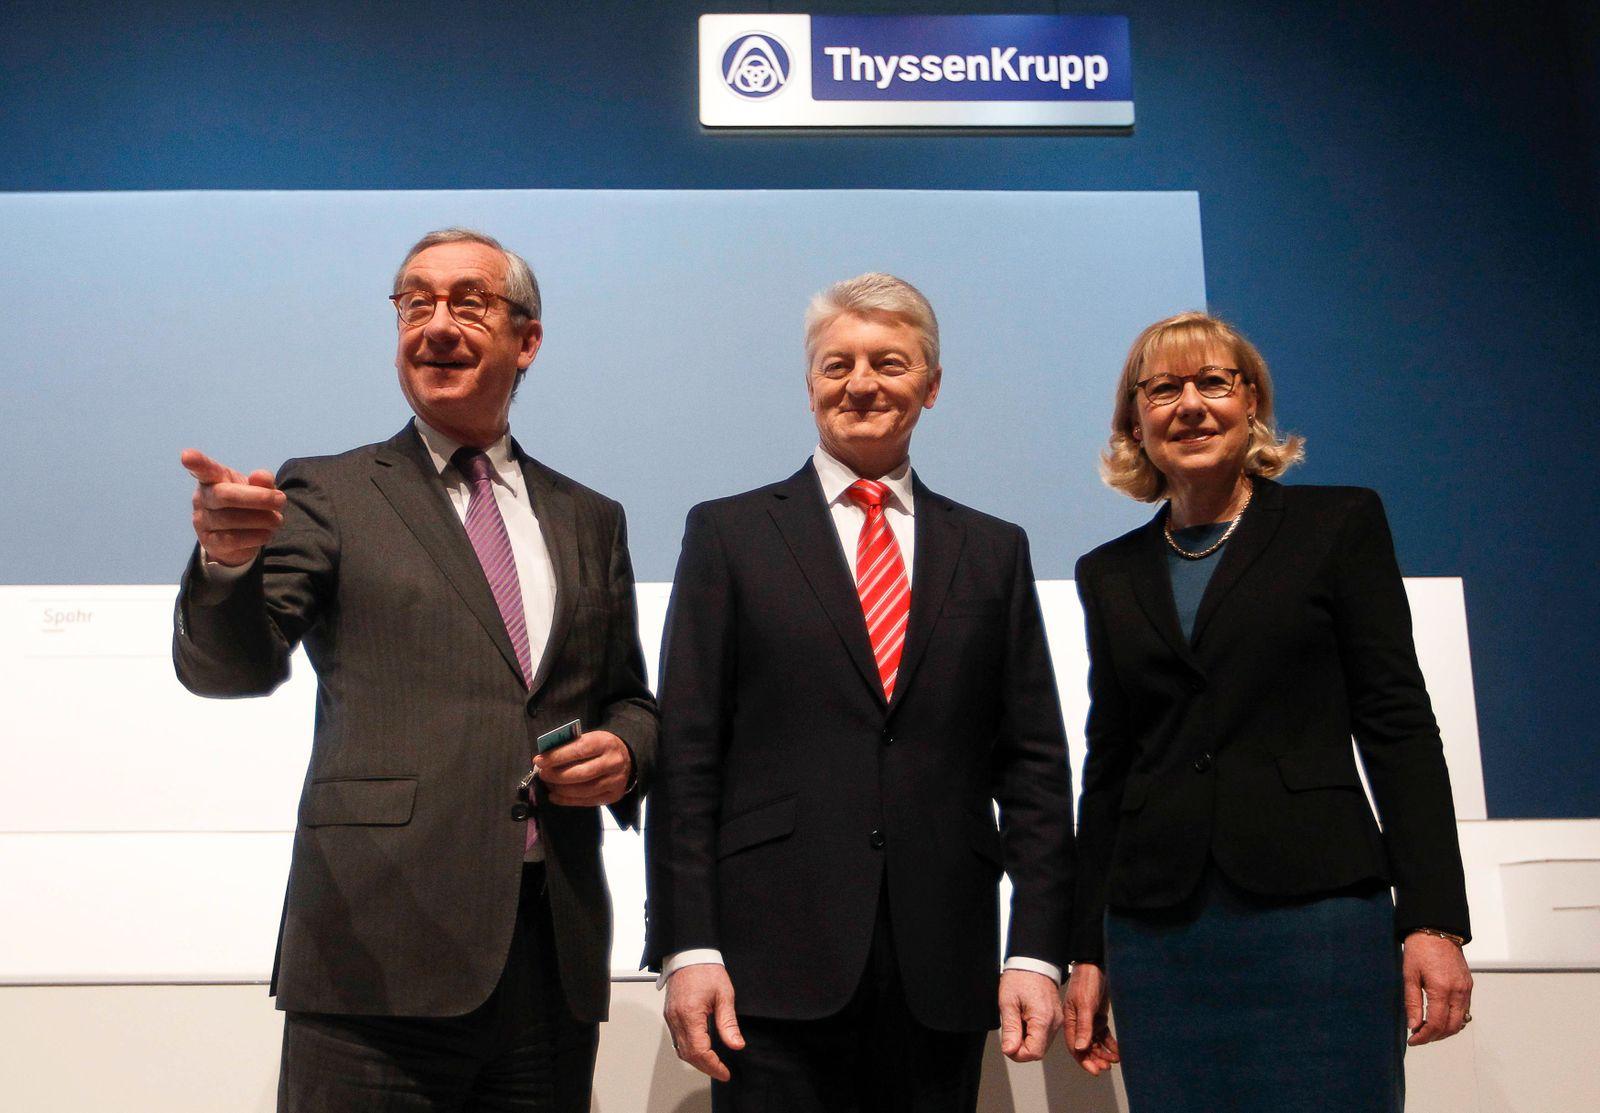 HV ThyssenKrupp / Vorstand (Kopie)